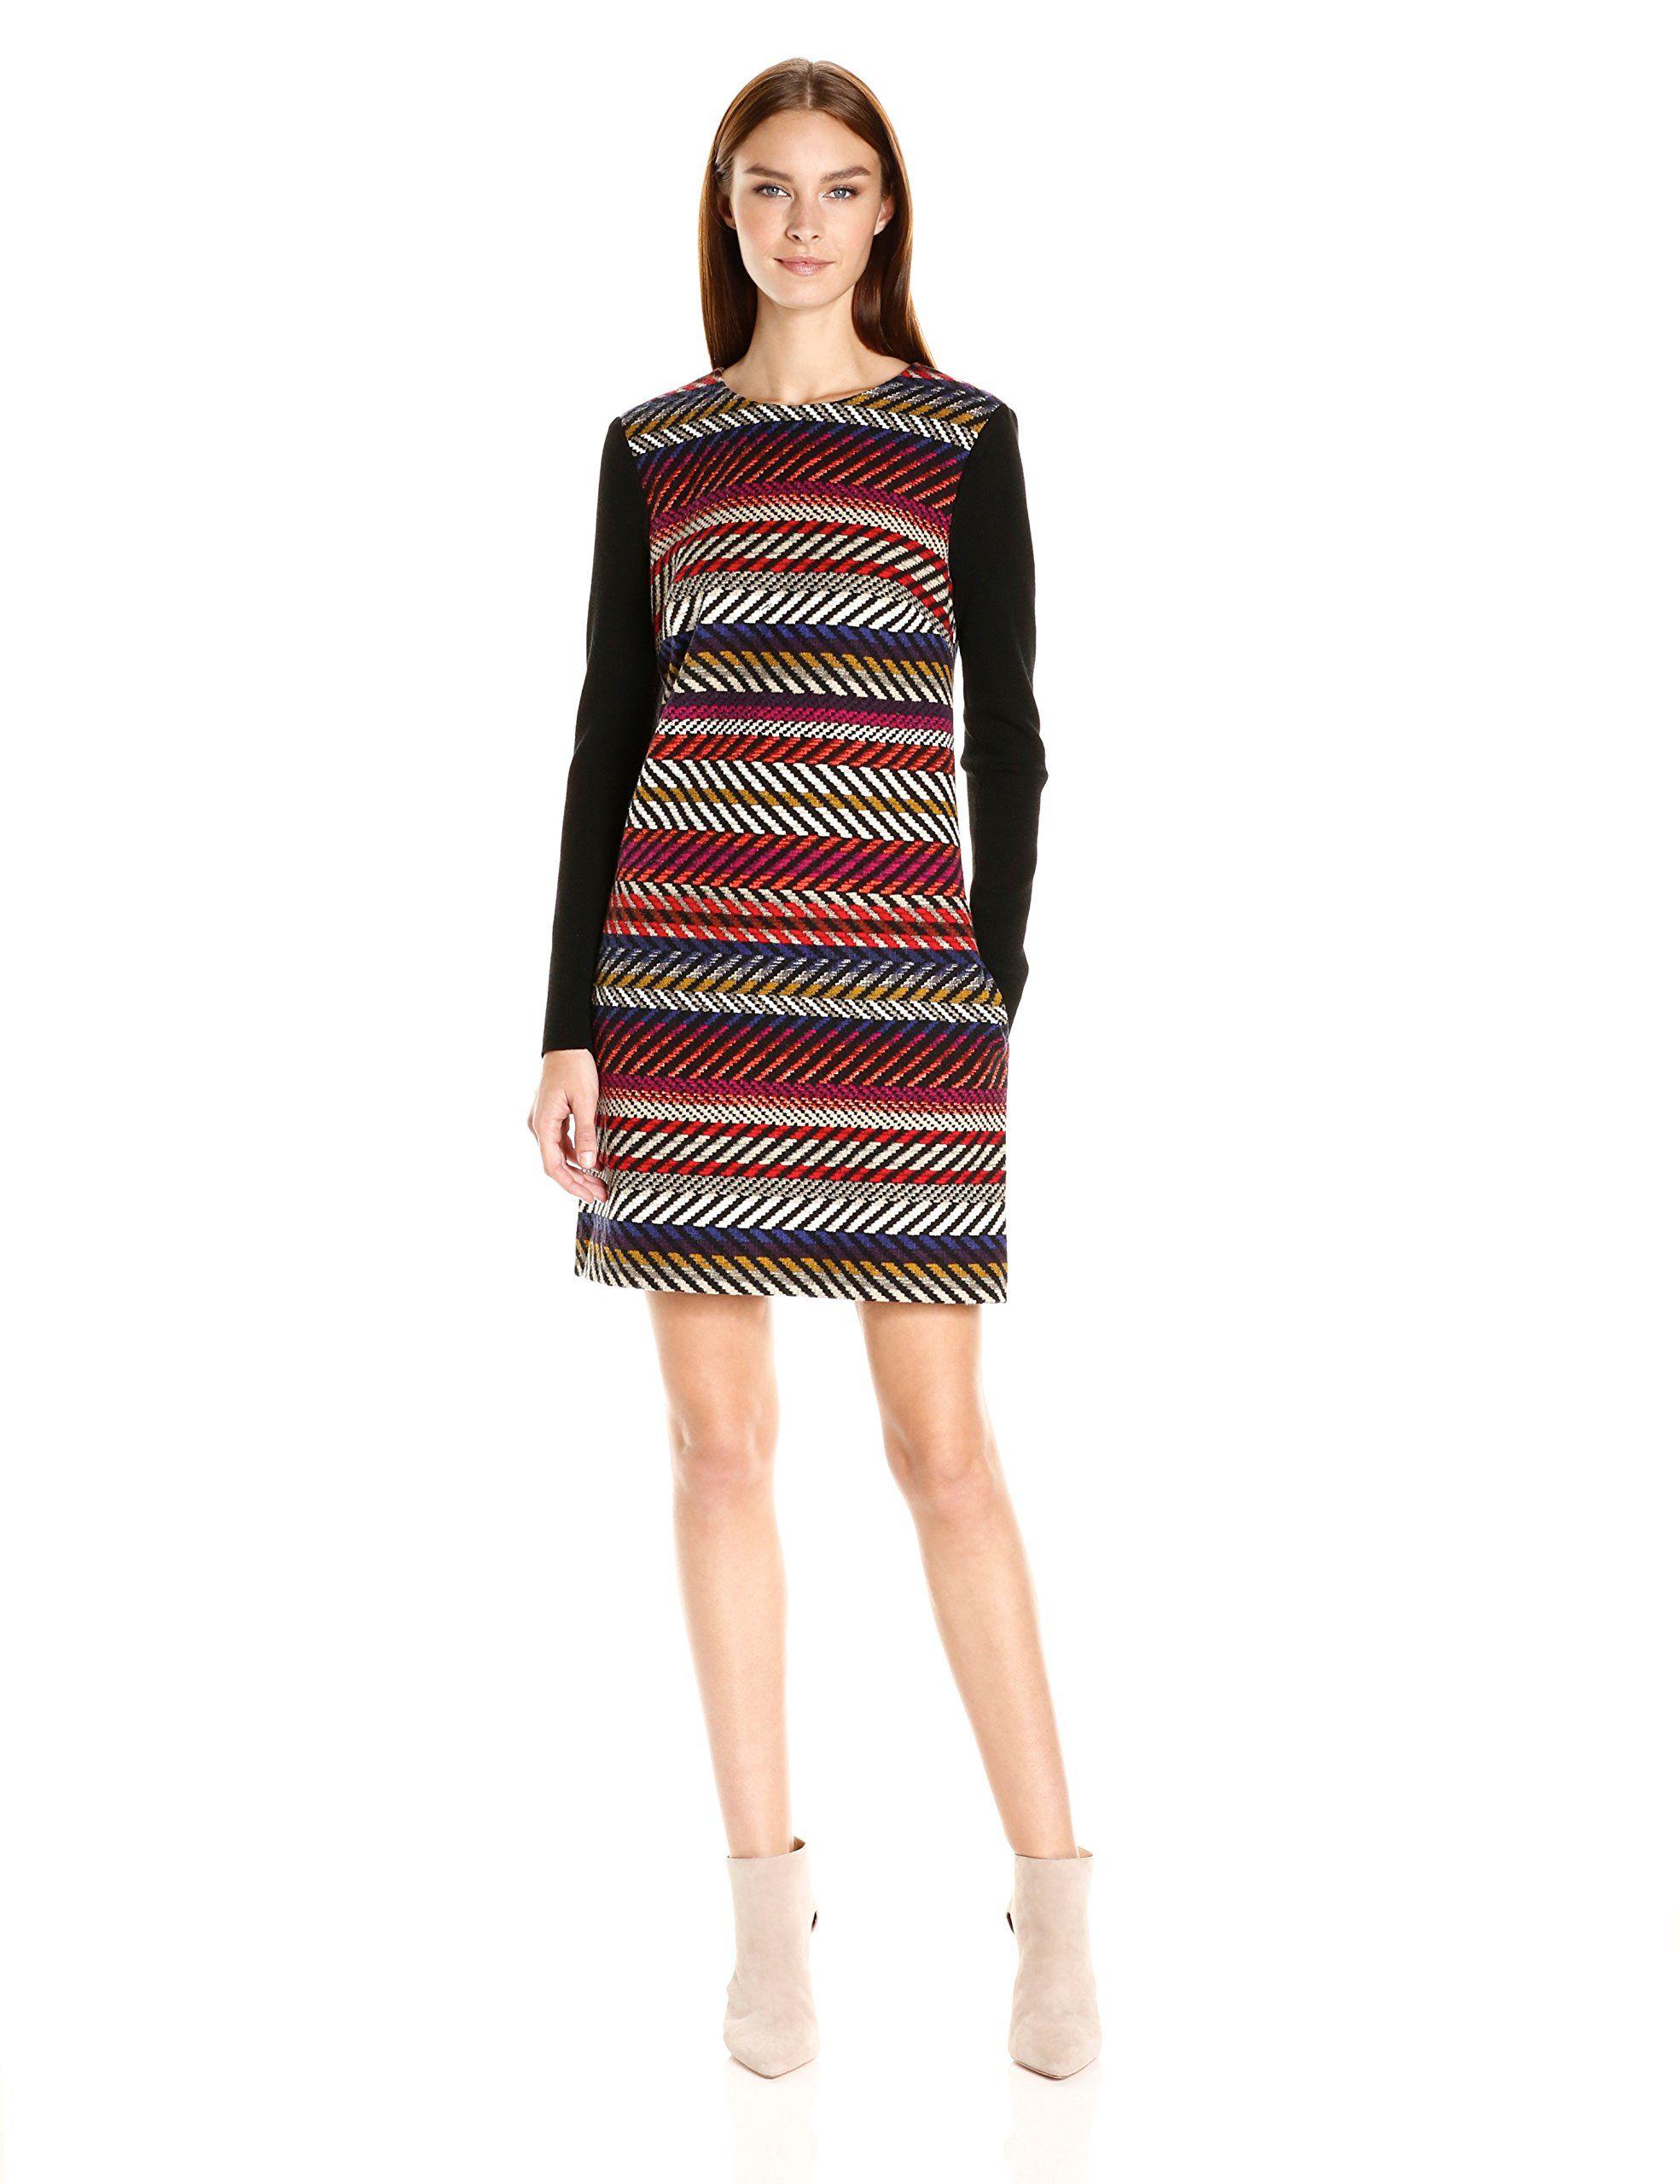 efbe2574d4c Trina Turk Women s Chapin Kingscote Stripe Long Sleeve Dress ...